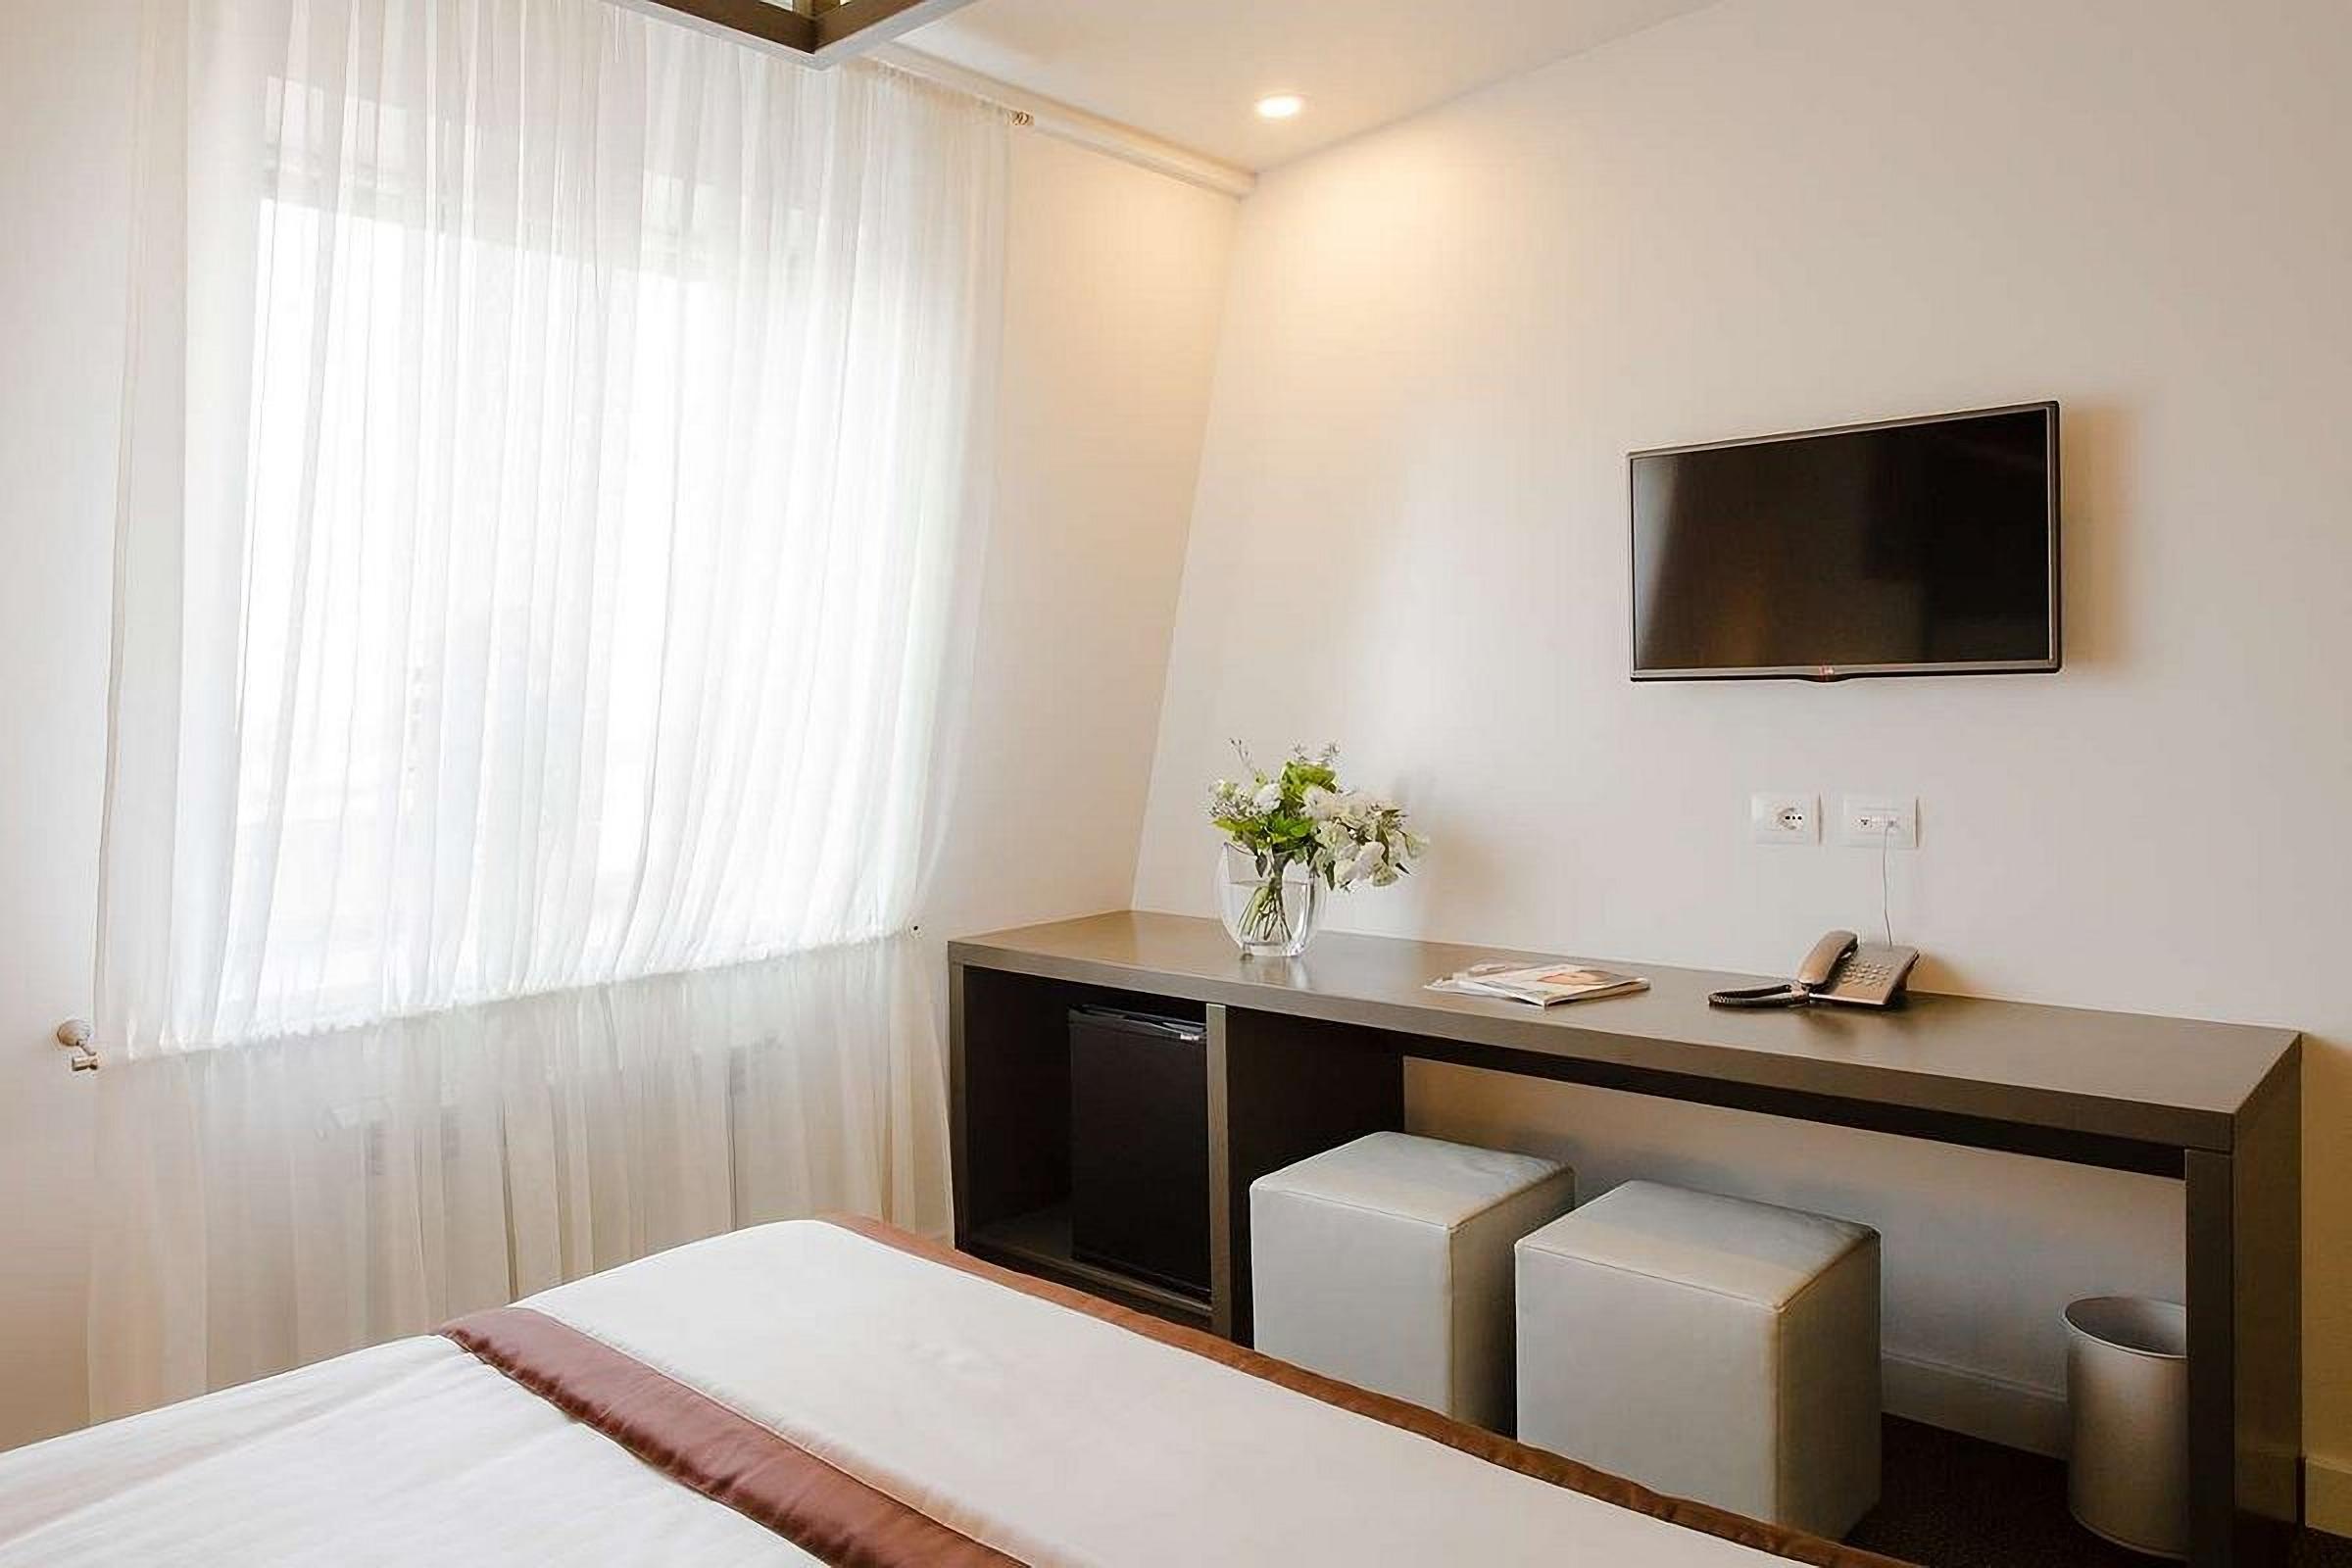 Standard Room Furnishings at UNO Design Hotel Odessa Ukraine